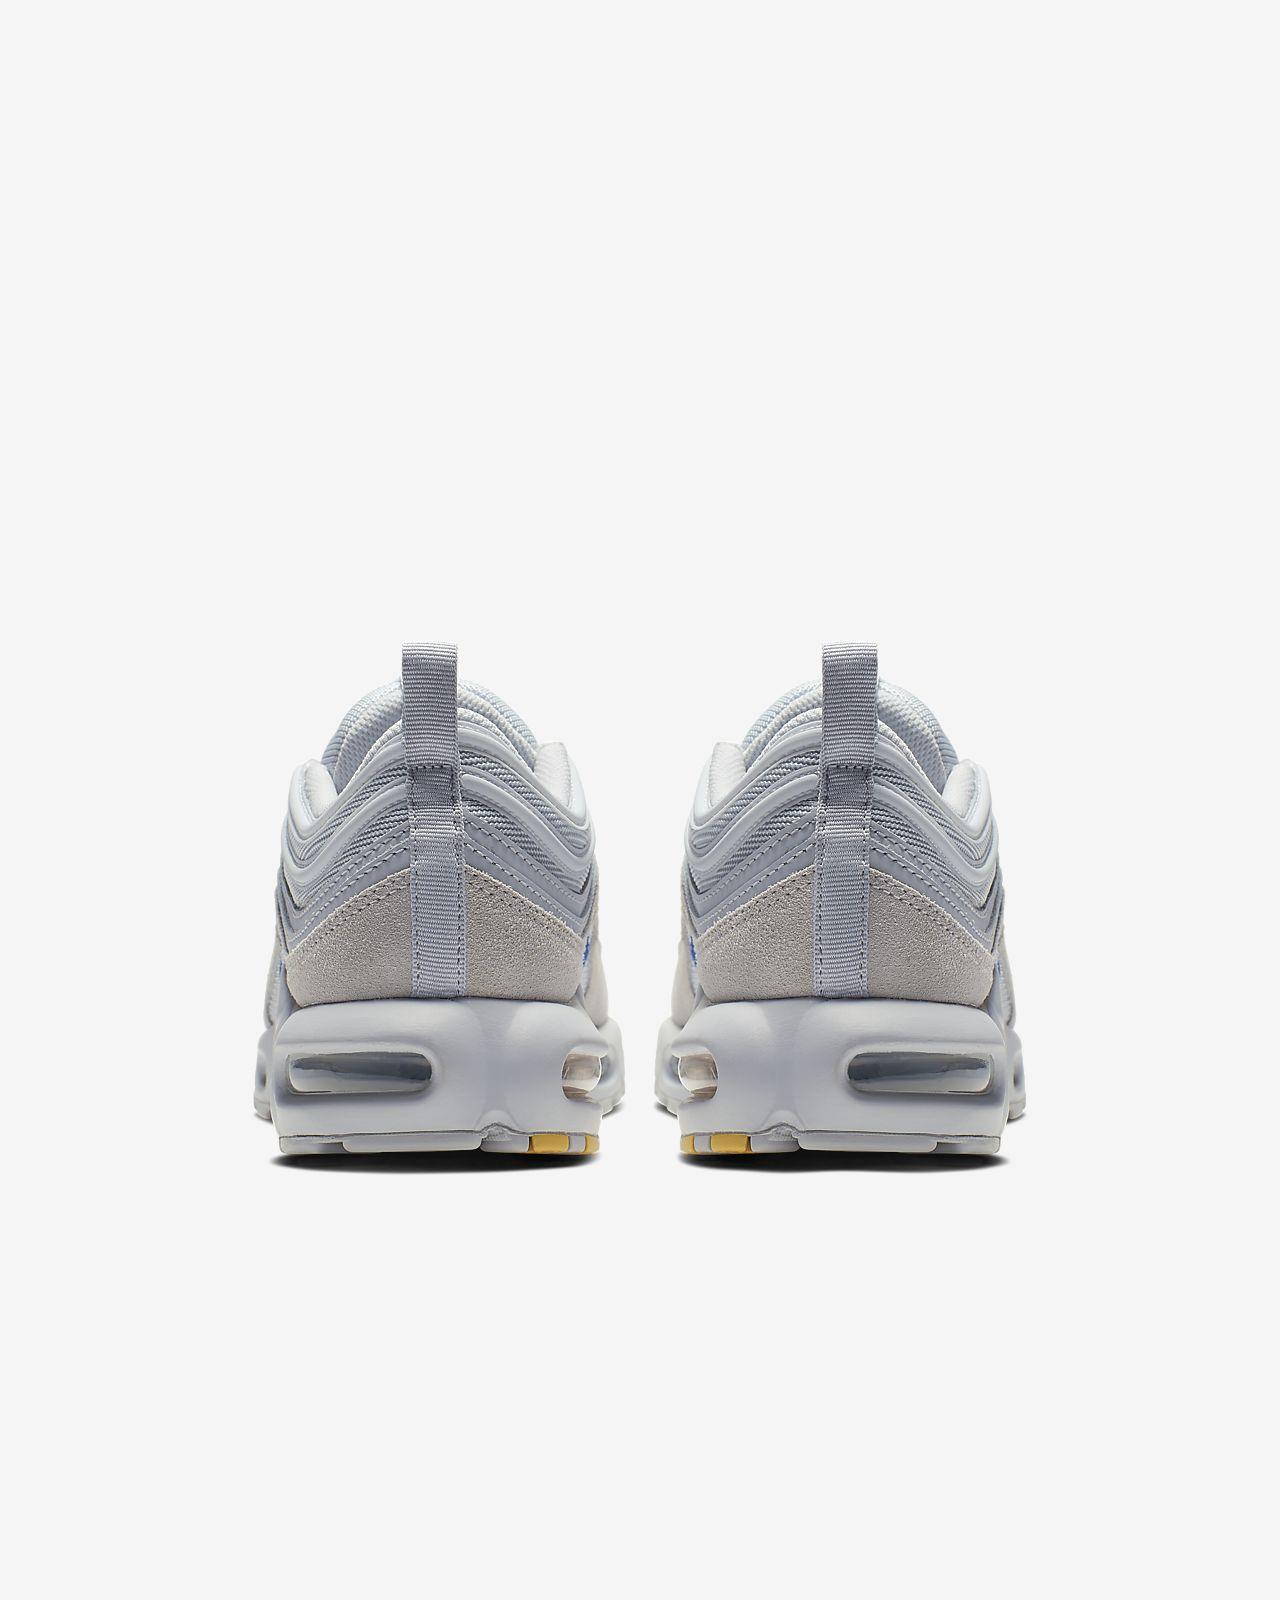 newest 96b2f 93a97 ... Sapatilhas Nike Air Max Plus 97 para homem